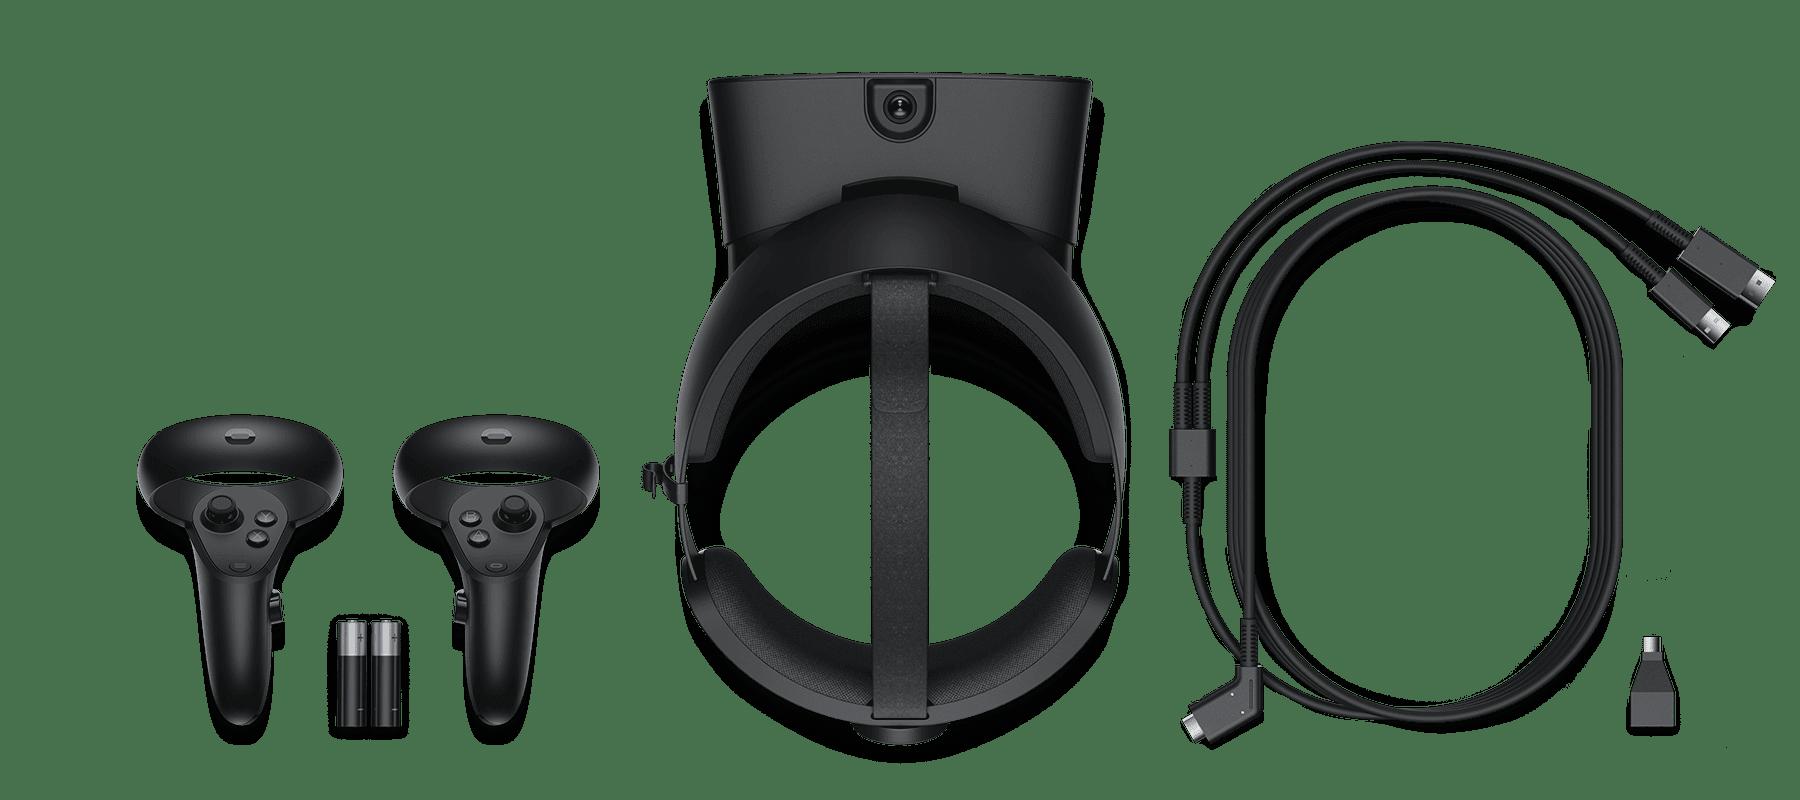 Oculus Rift S İnceleme